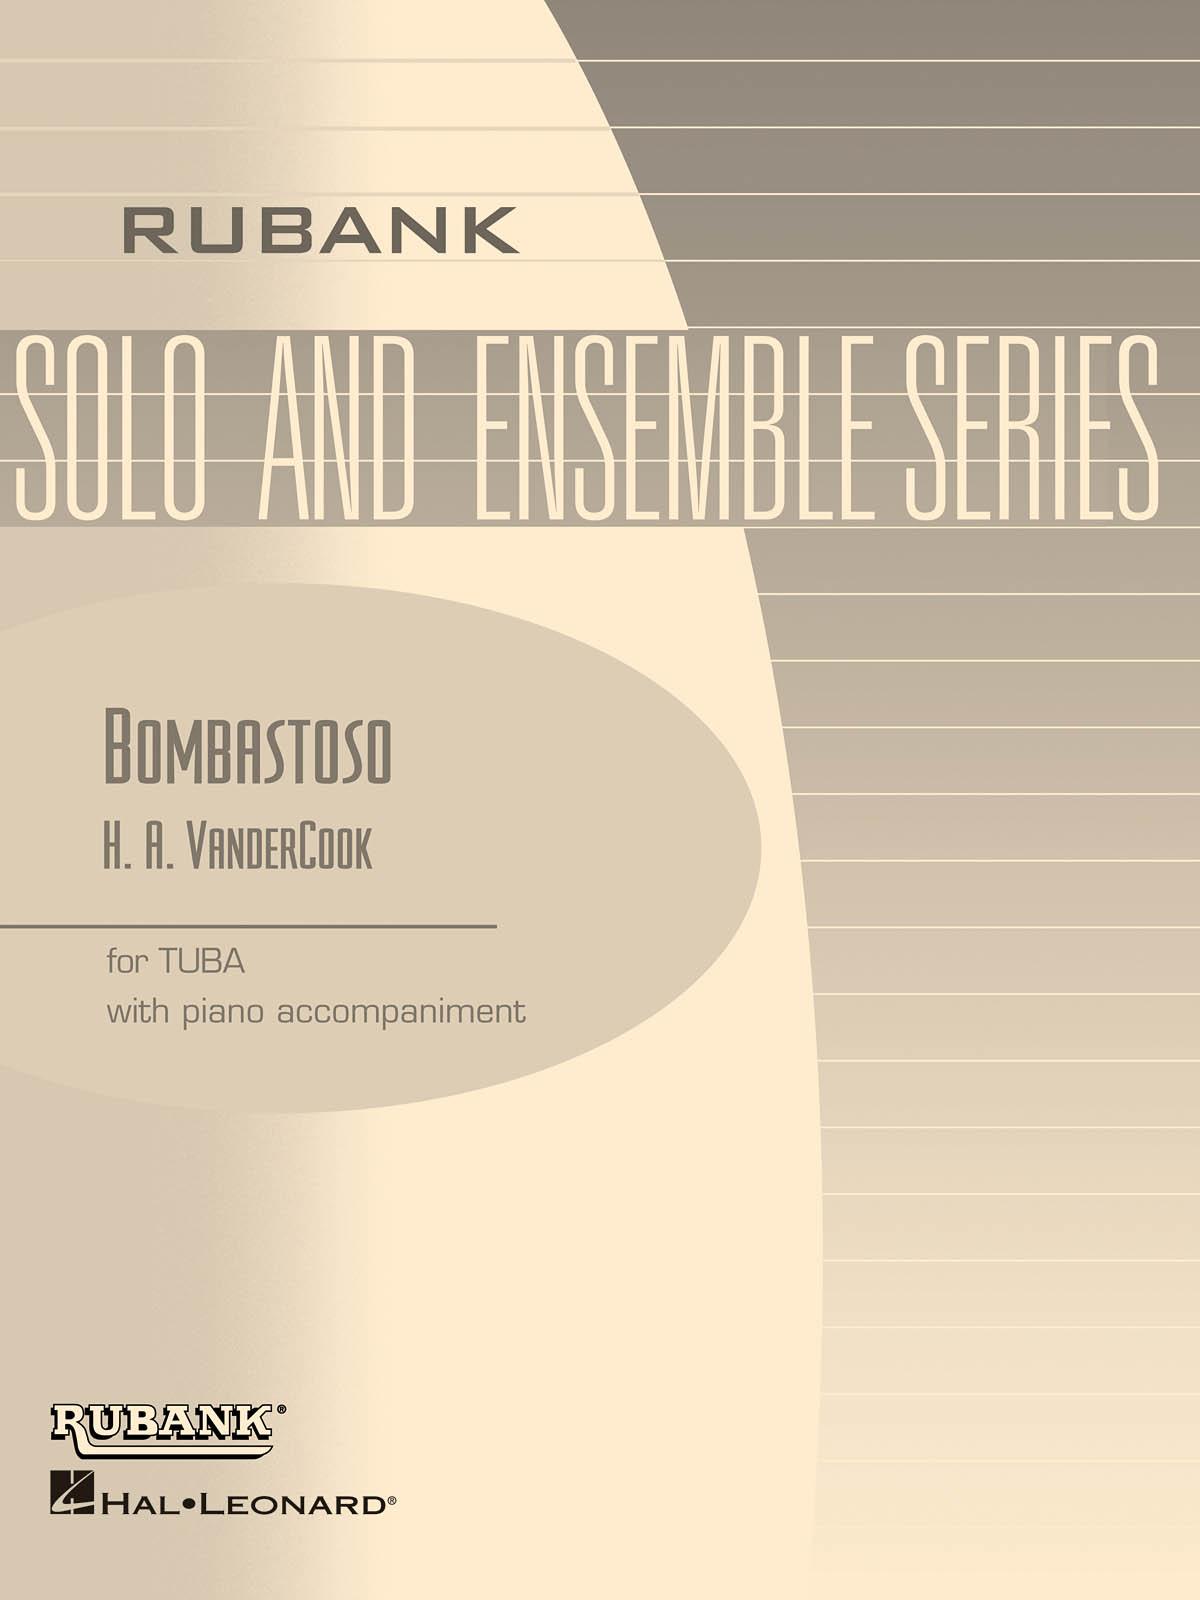 H.A. VanderCook: Bombastoso - Bass (Tuba) Solos with Piano: Tuba Solo: